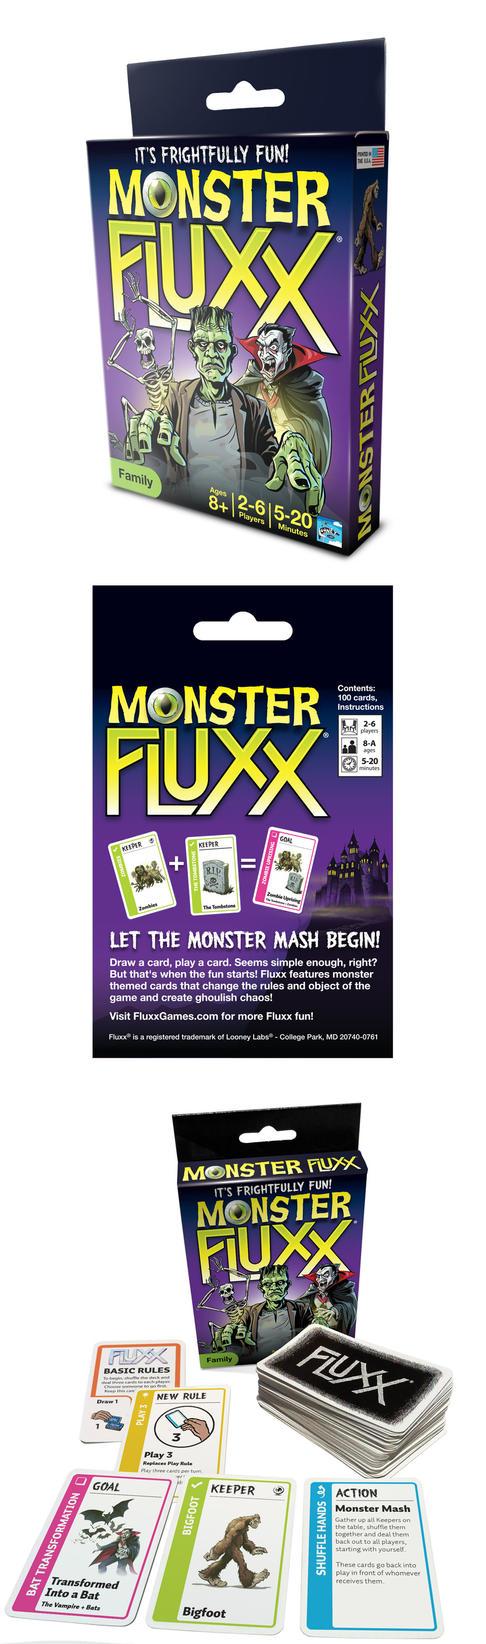 Monster Fluxx card game packaging by abnormalbrain